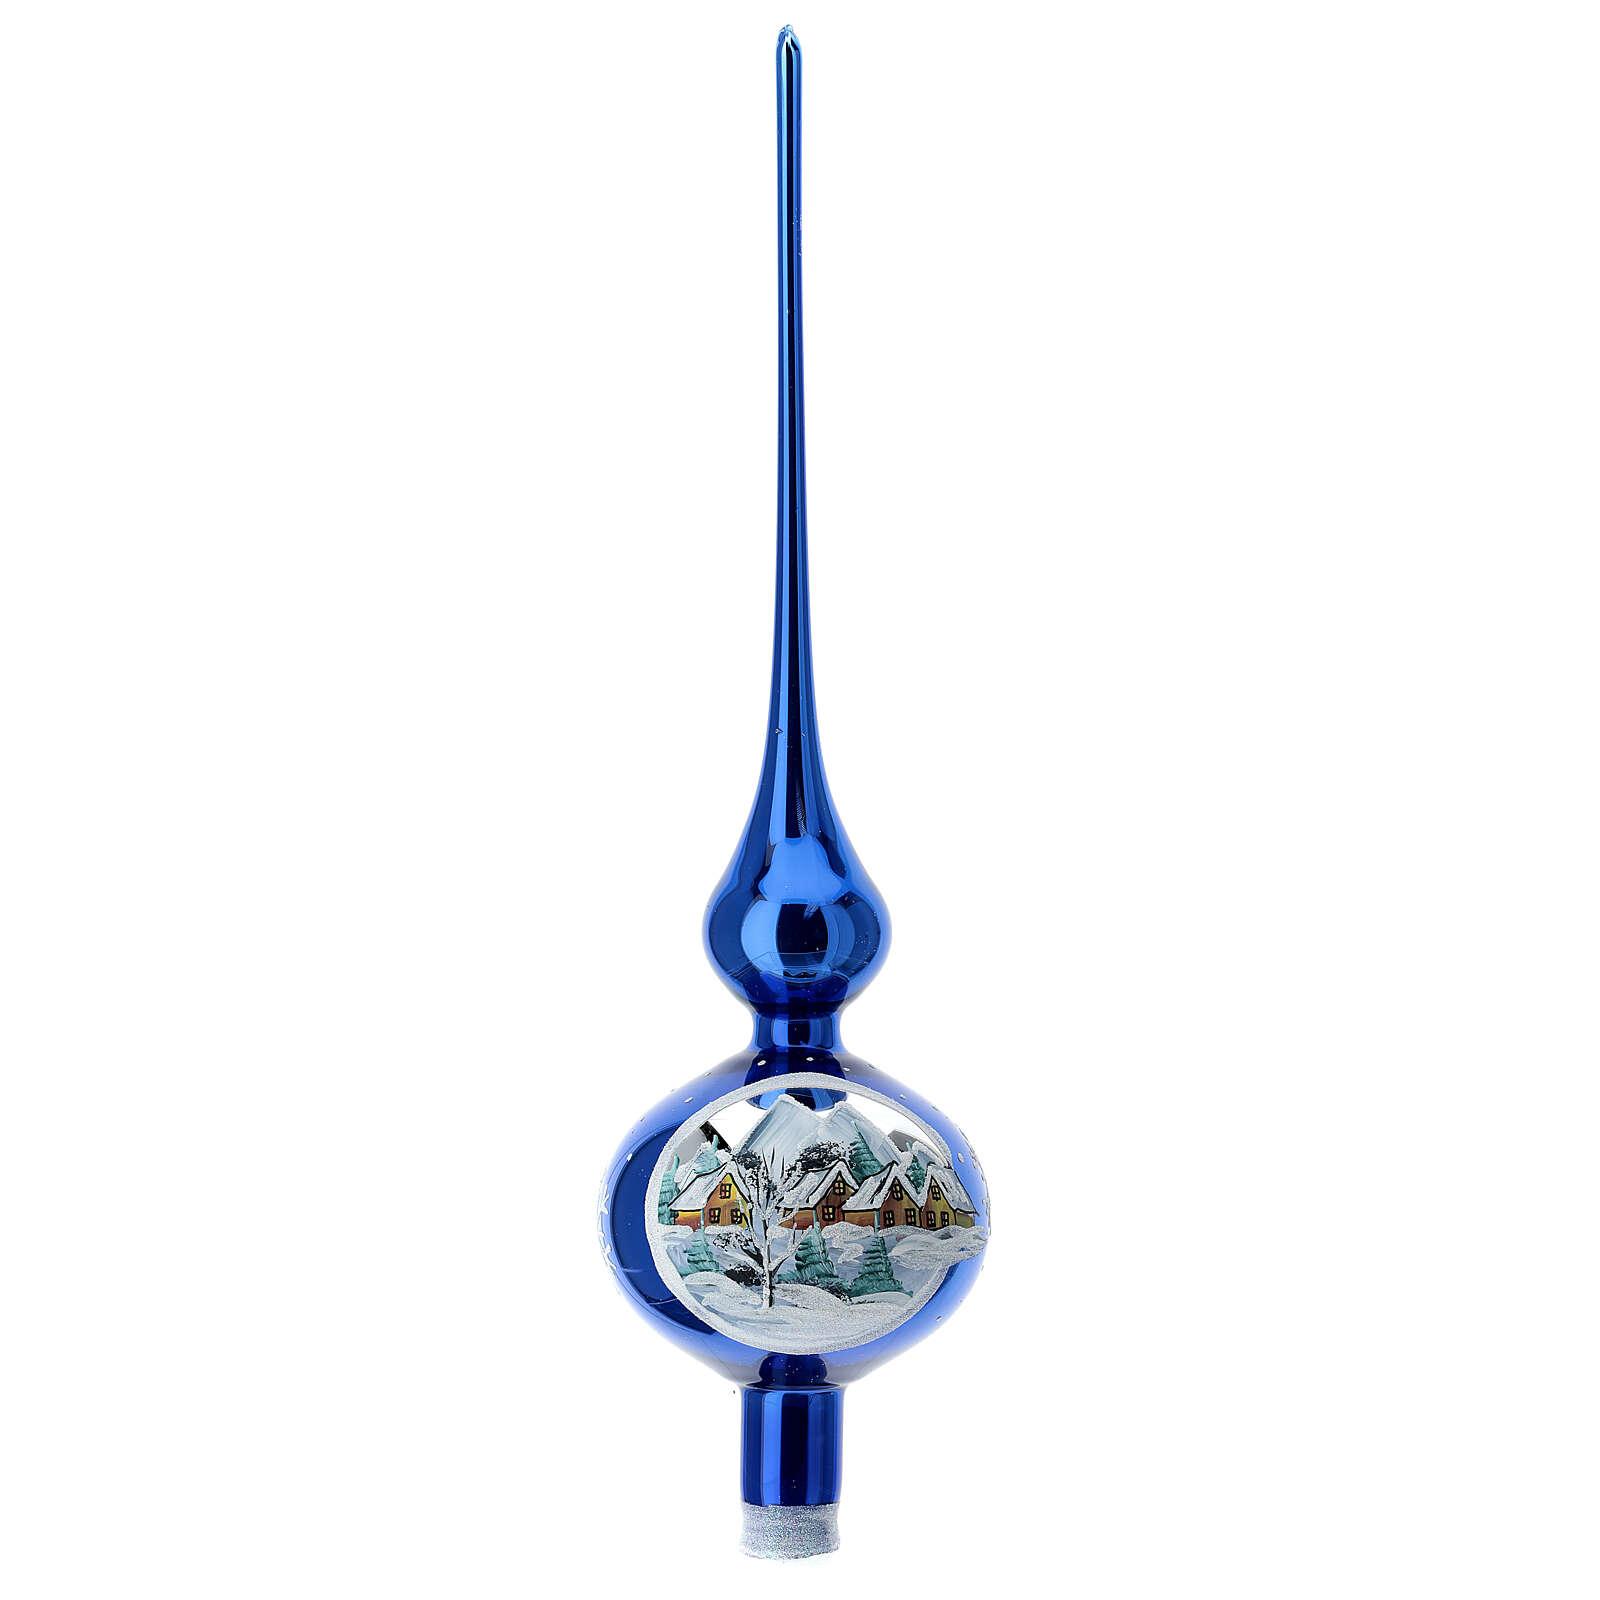 Finial tree topper electric blue snowy village blown glass 35 cm 4